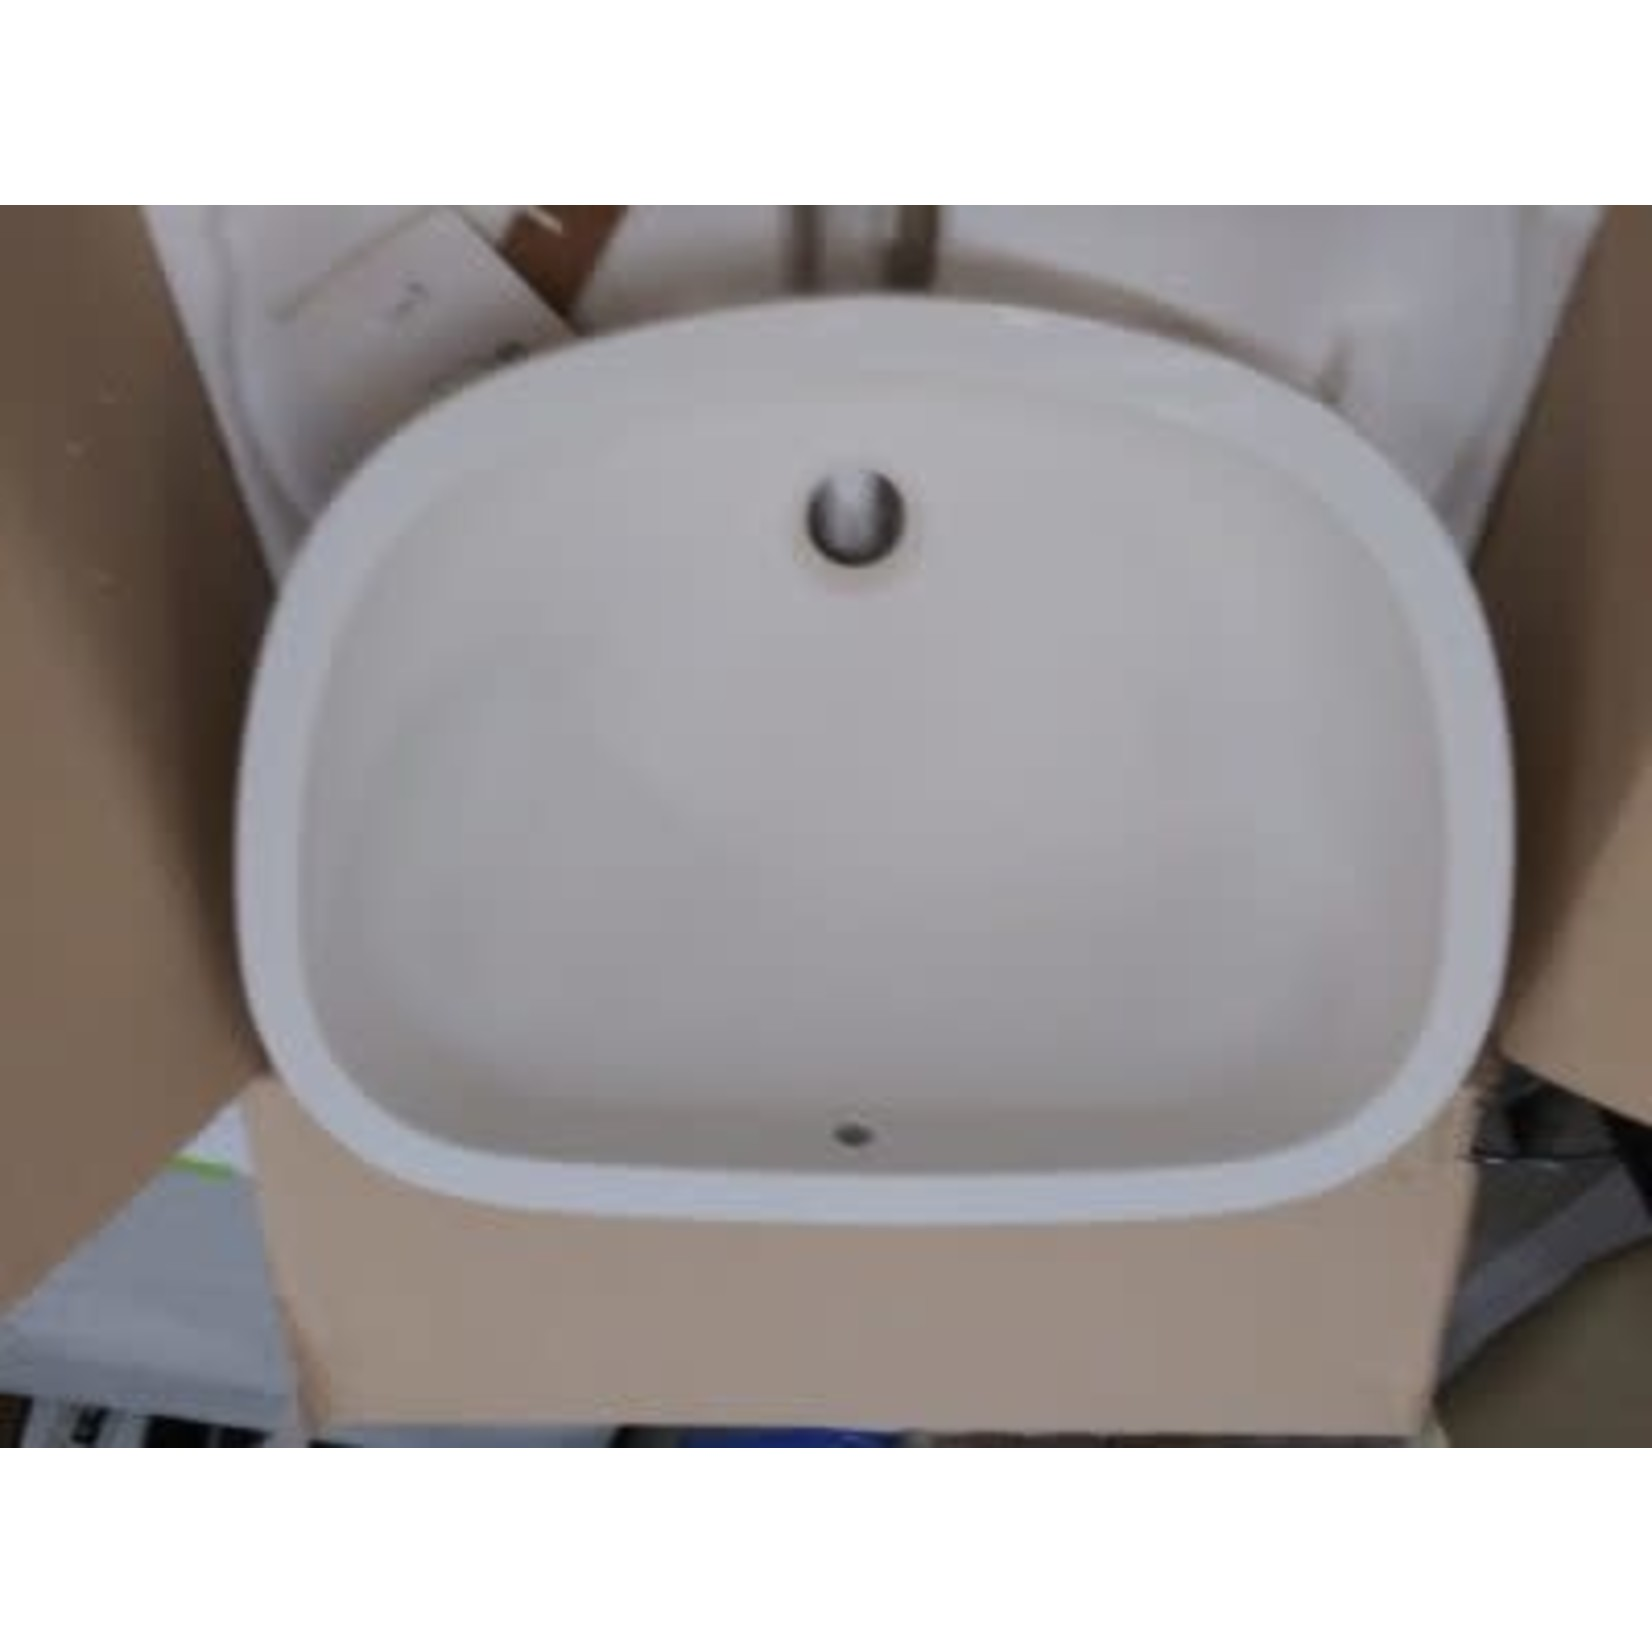 2803 DuPont Corian 830s Undermount Sink